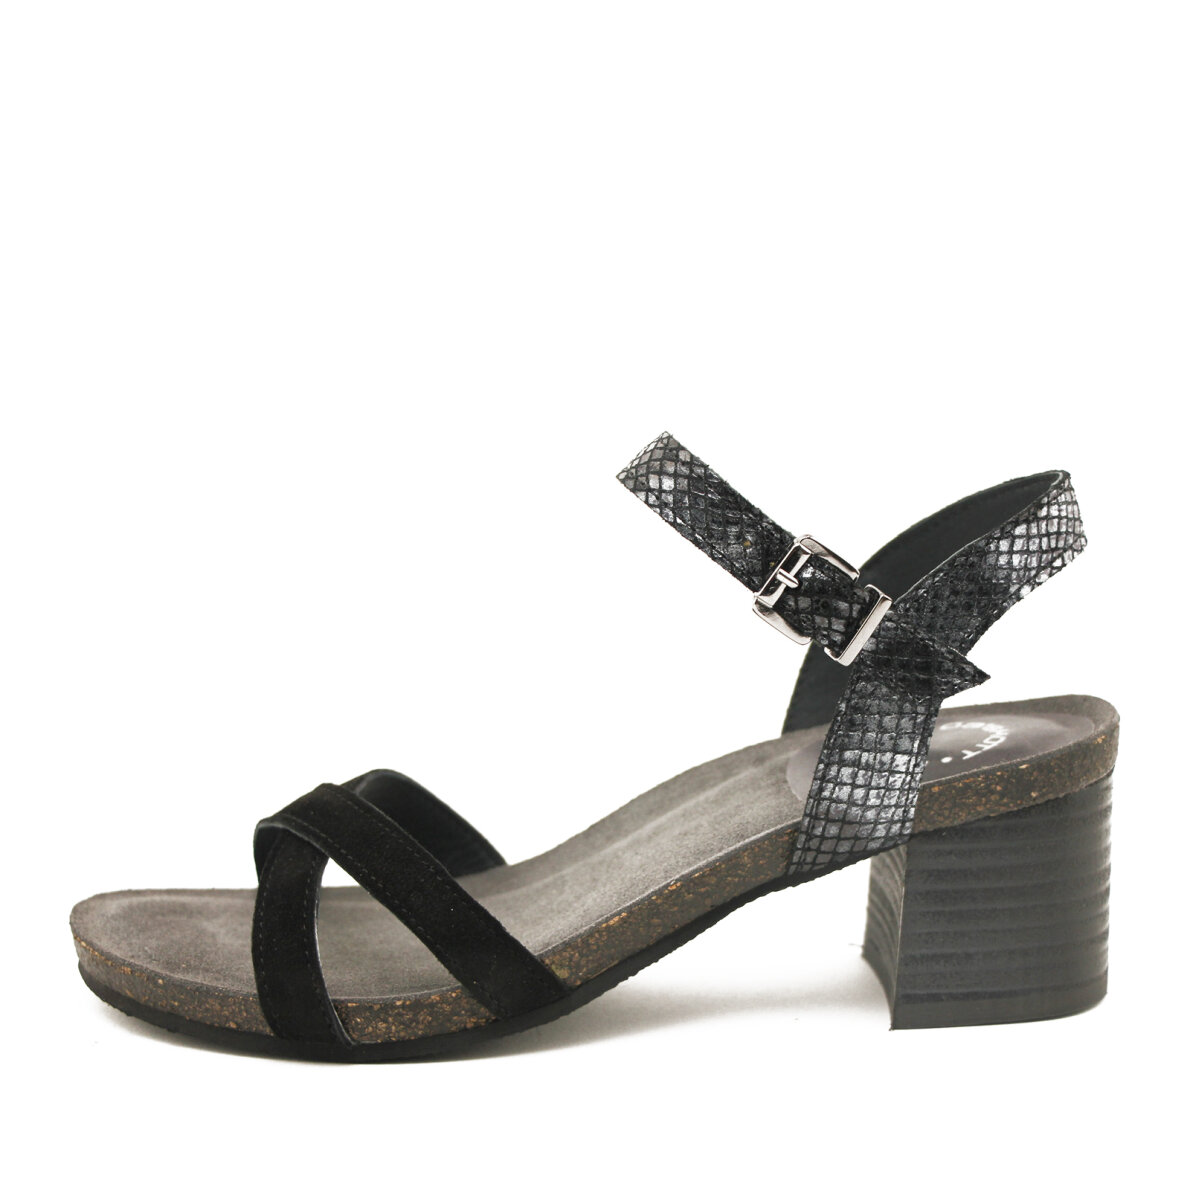 PIEDI Cashott 21062 Sort Høj dame sandal med snakeprint